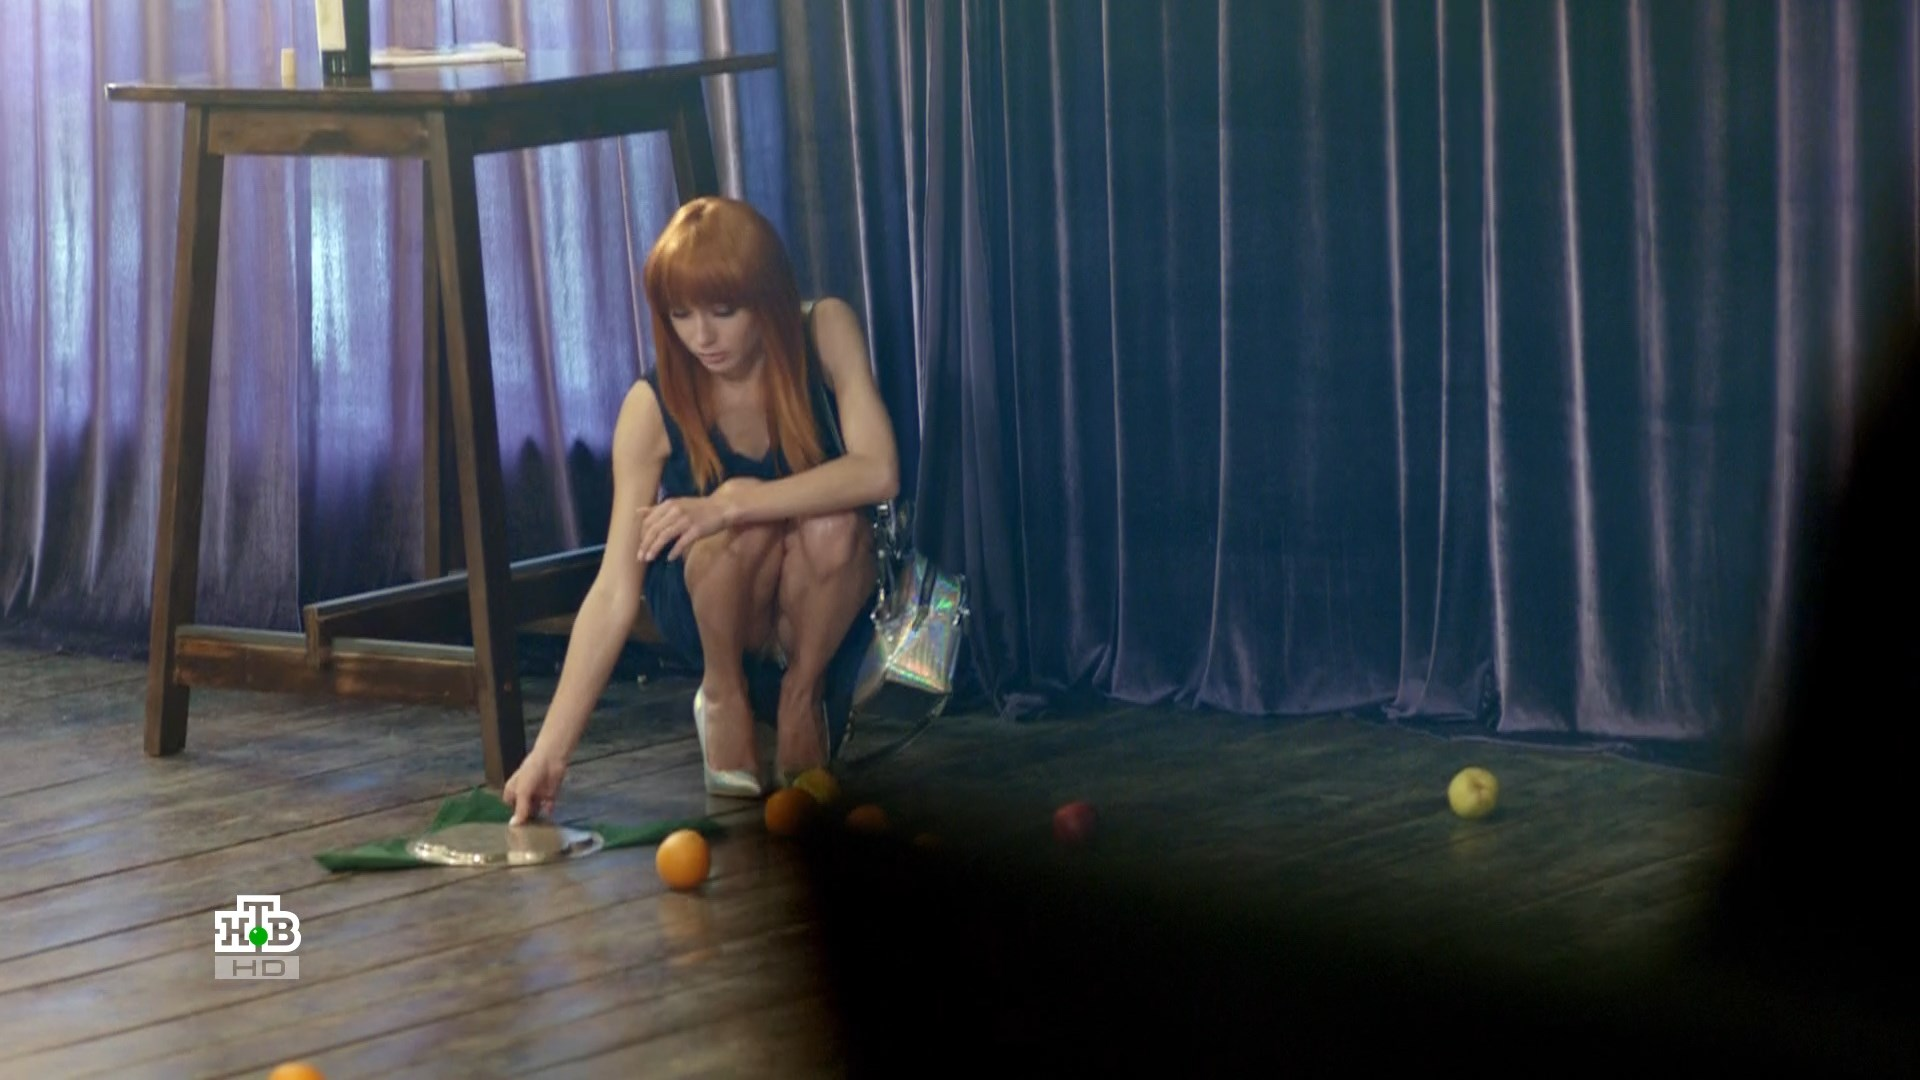 Арина Постникова. Под прикрытием. 5 серия.ts_snapshot_00.04.062.jpg